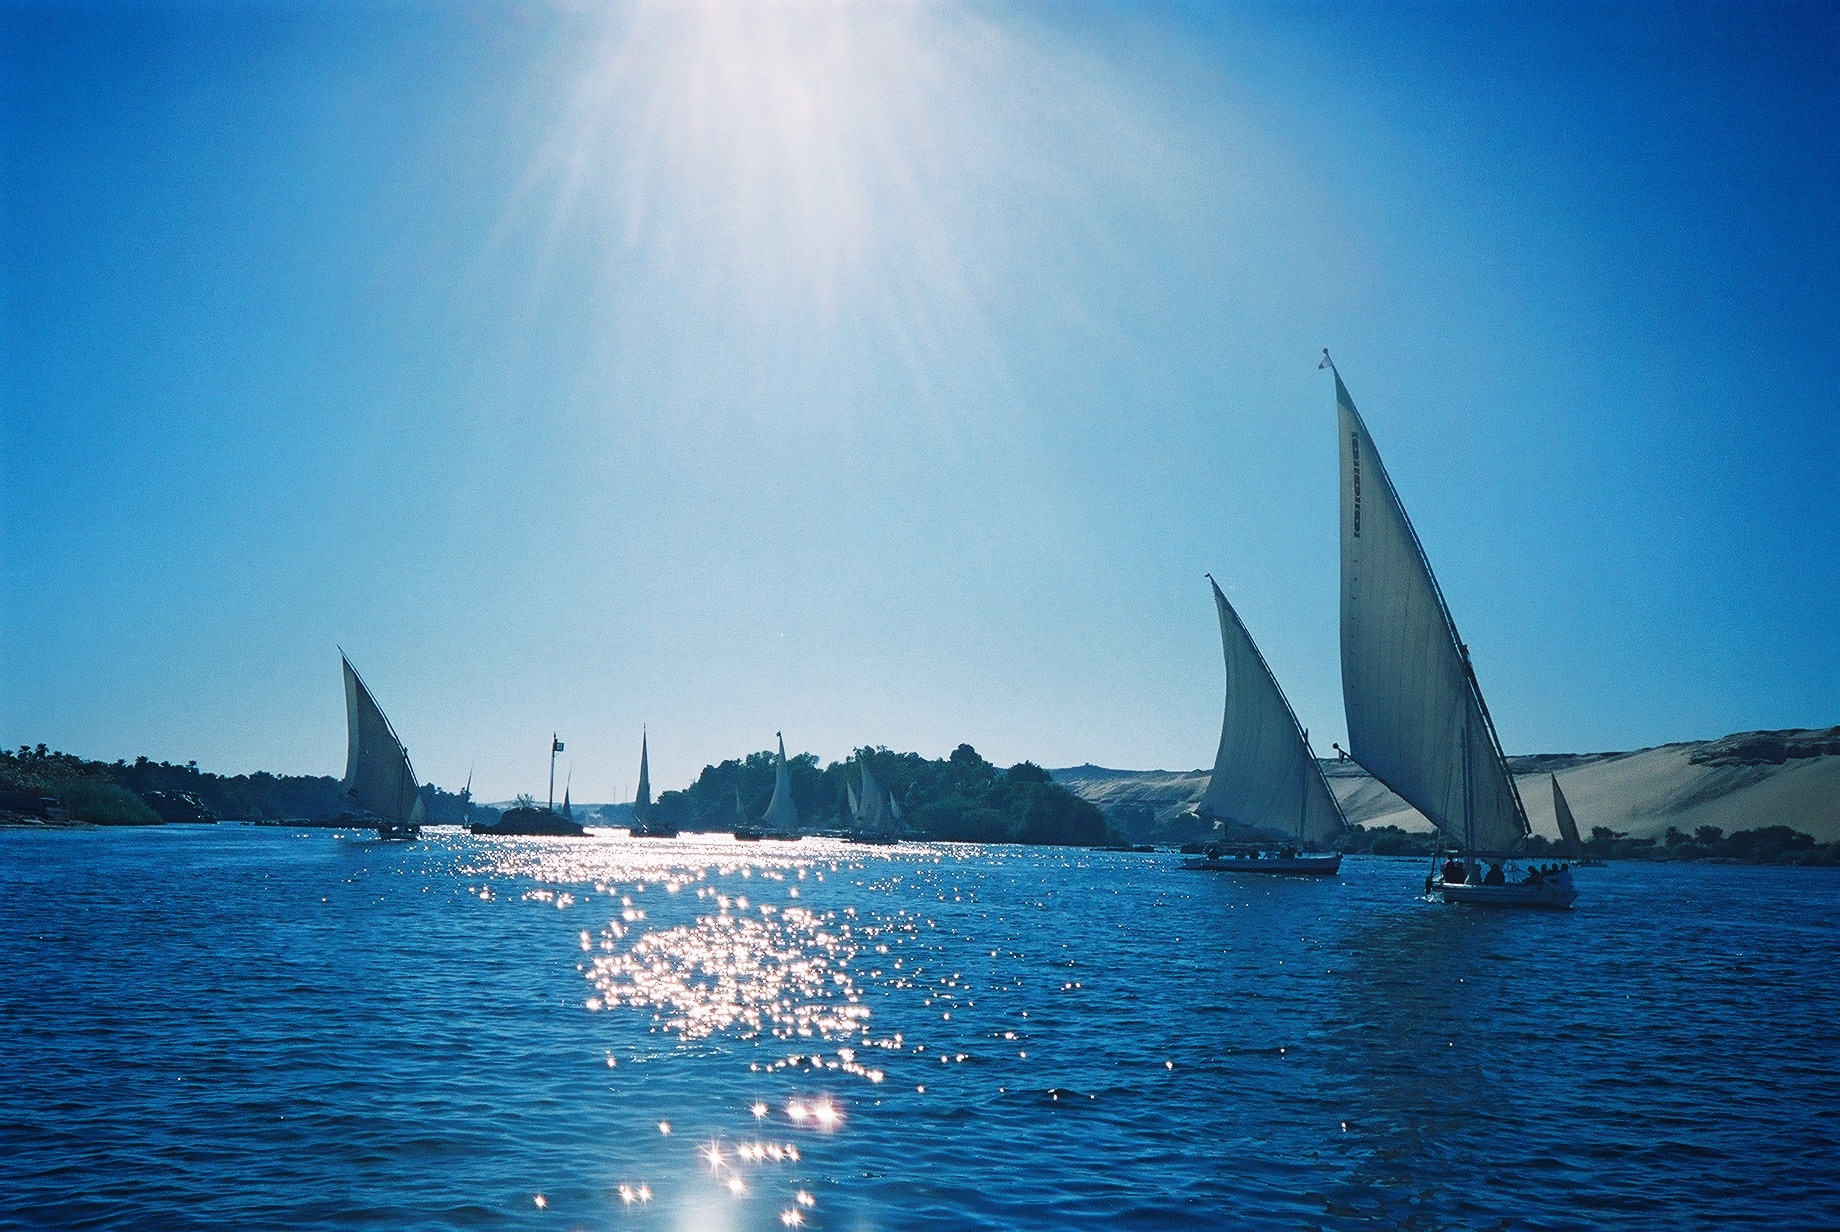 #egypt #egypttourism #aswan #aswannile #feluccasnile #nile